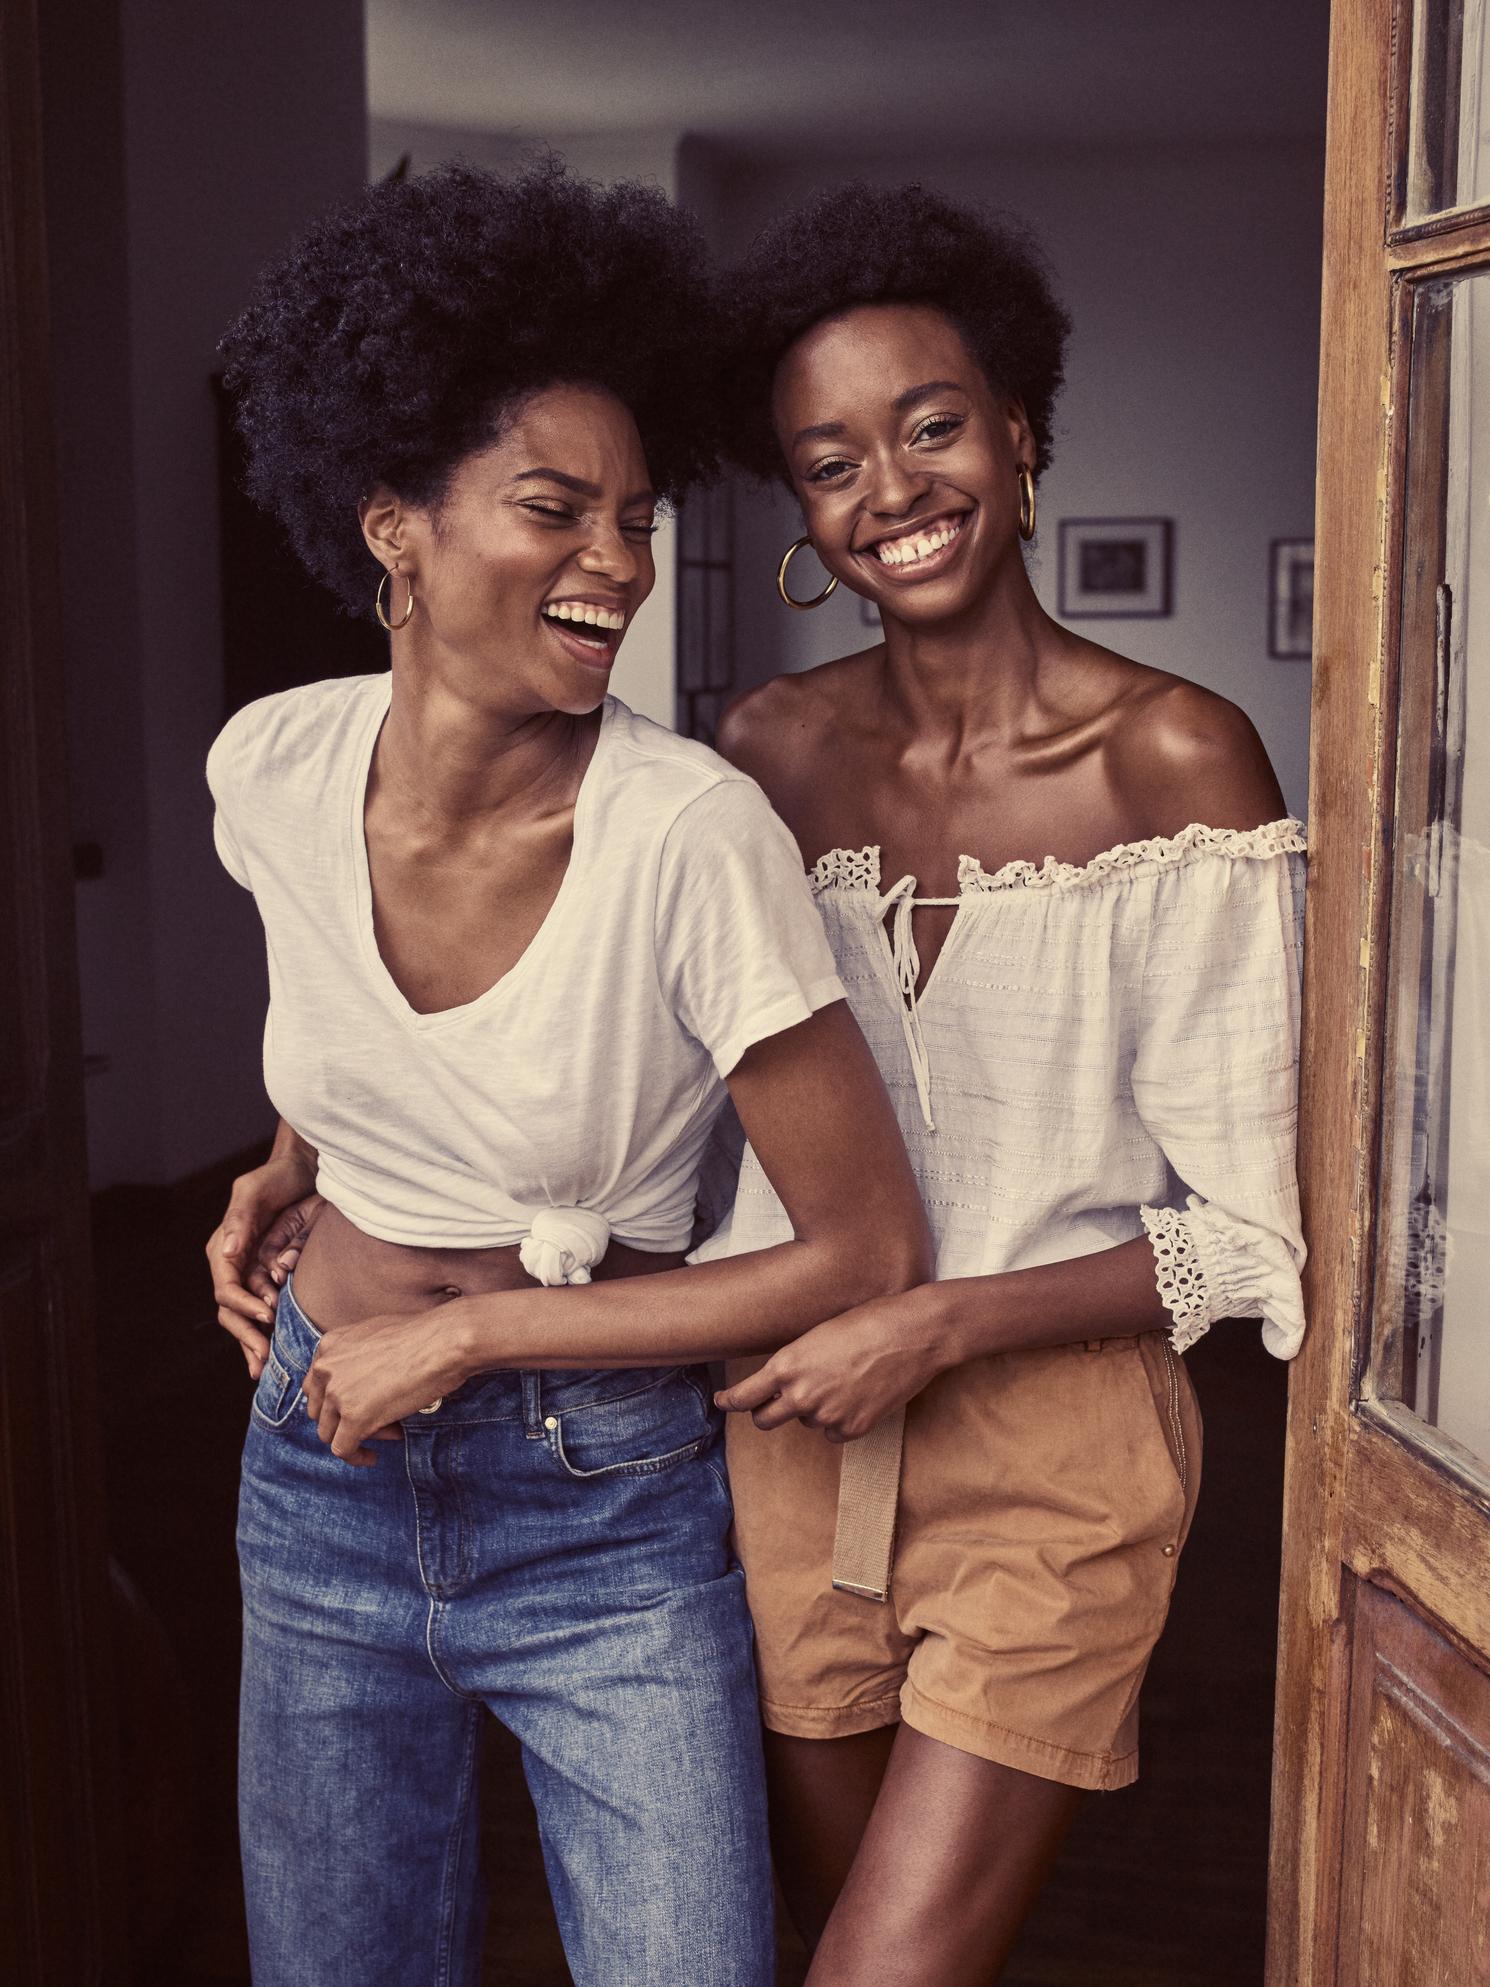 123260 Arden v-neck Tee- 127960 Bailey Turn-up Jeans – 126040 Skylar Vintage Blouse – 127920 Penton Shorts_1